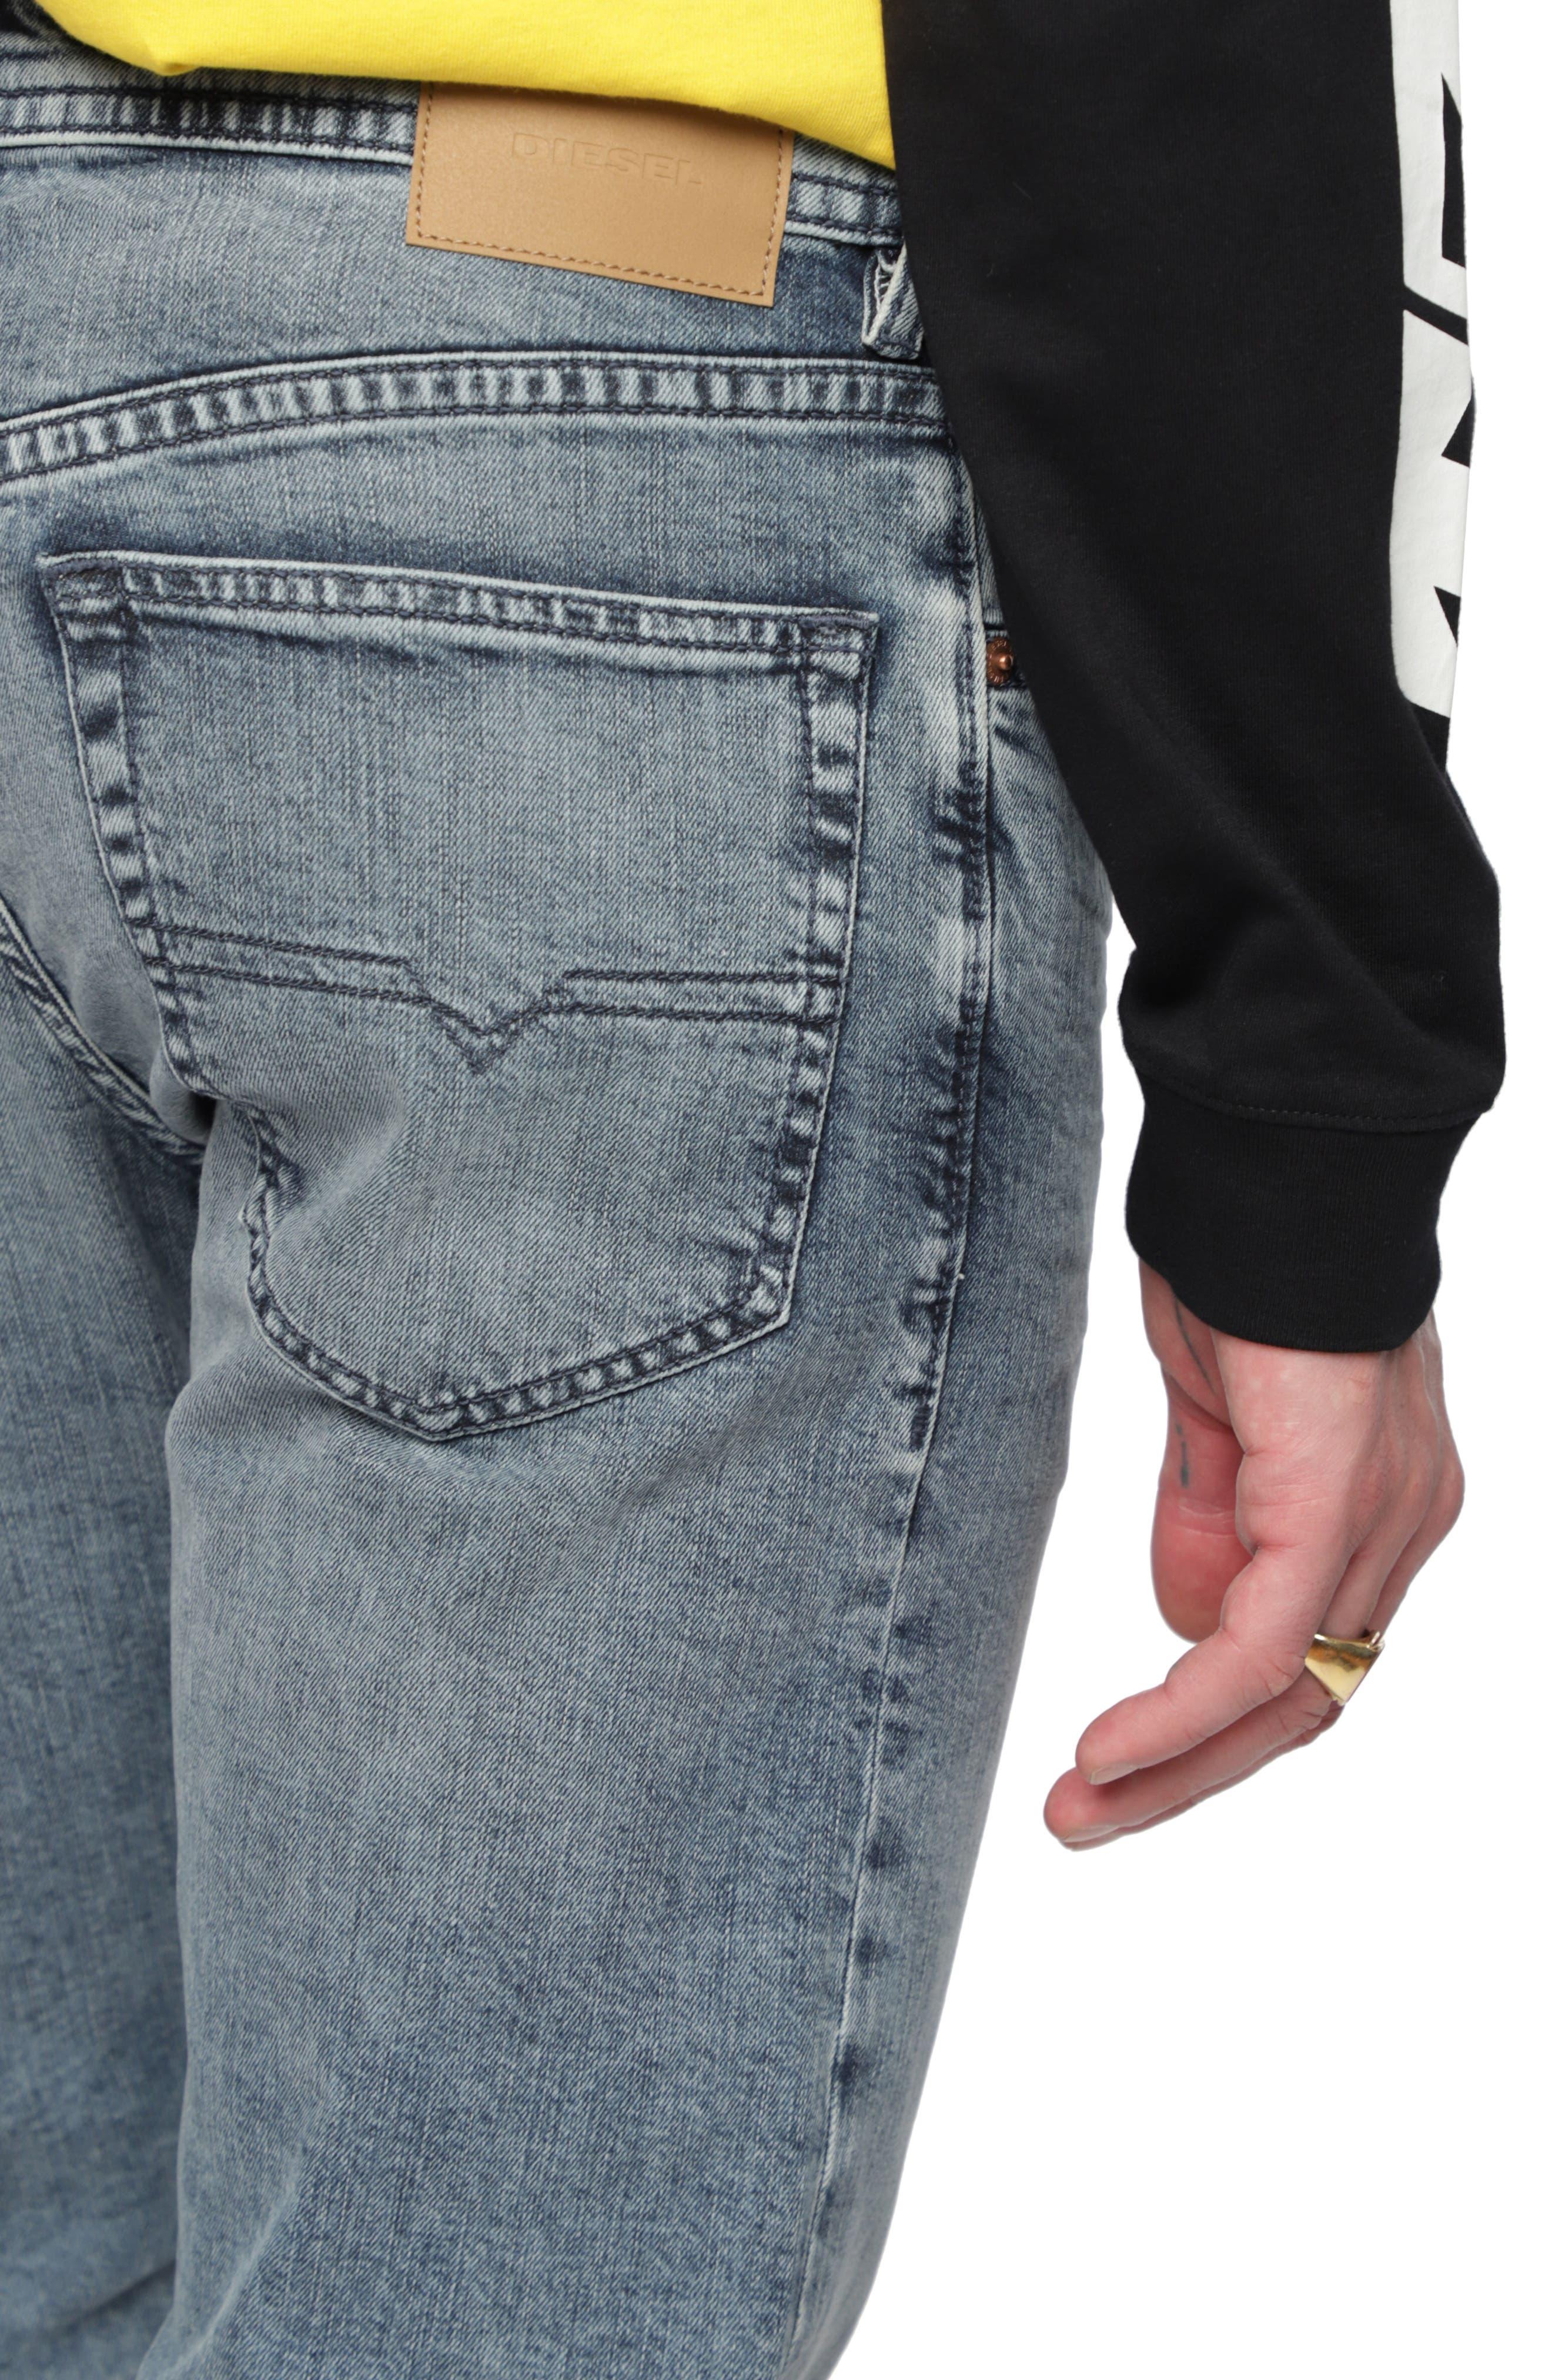 Buster Slim Fit Straight Leg Jeans,                             Alternate thumbnail 4, color,                             084Ux